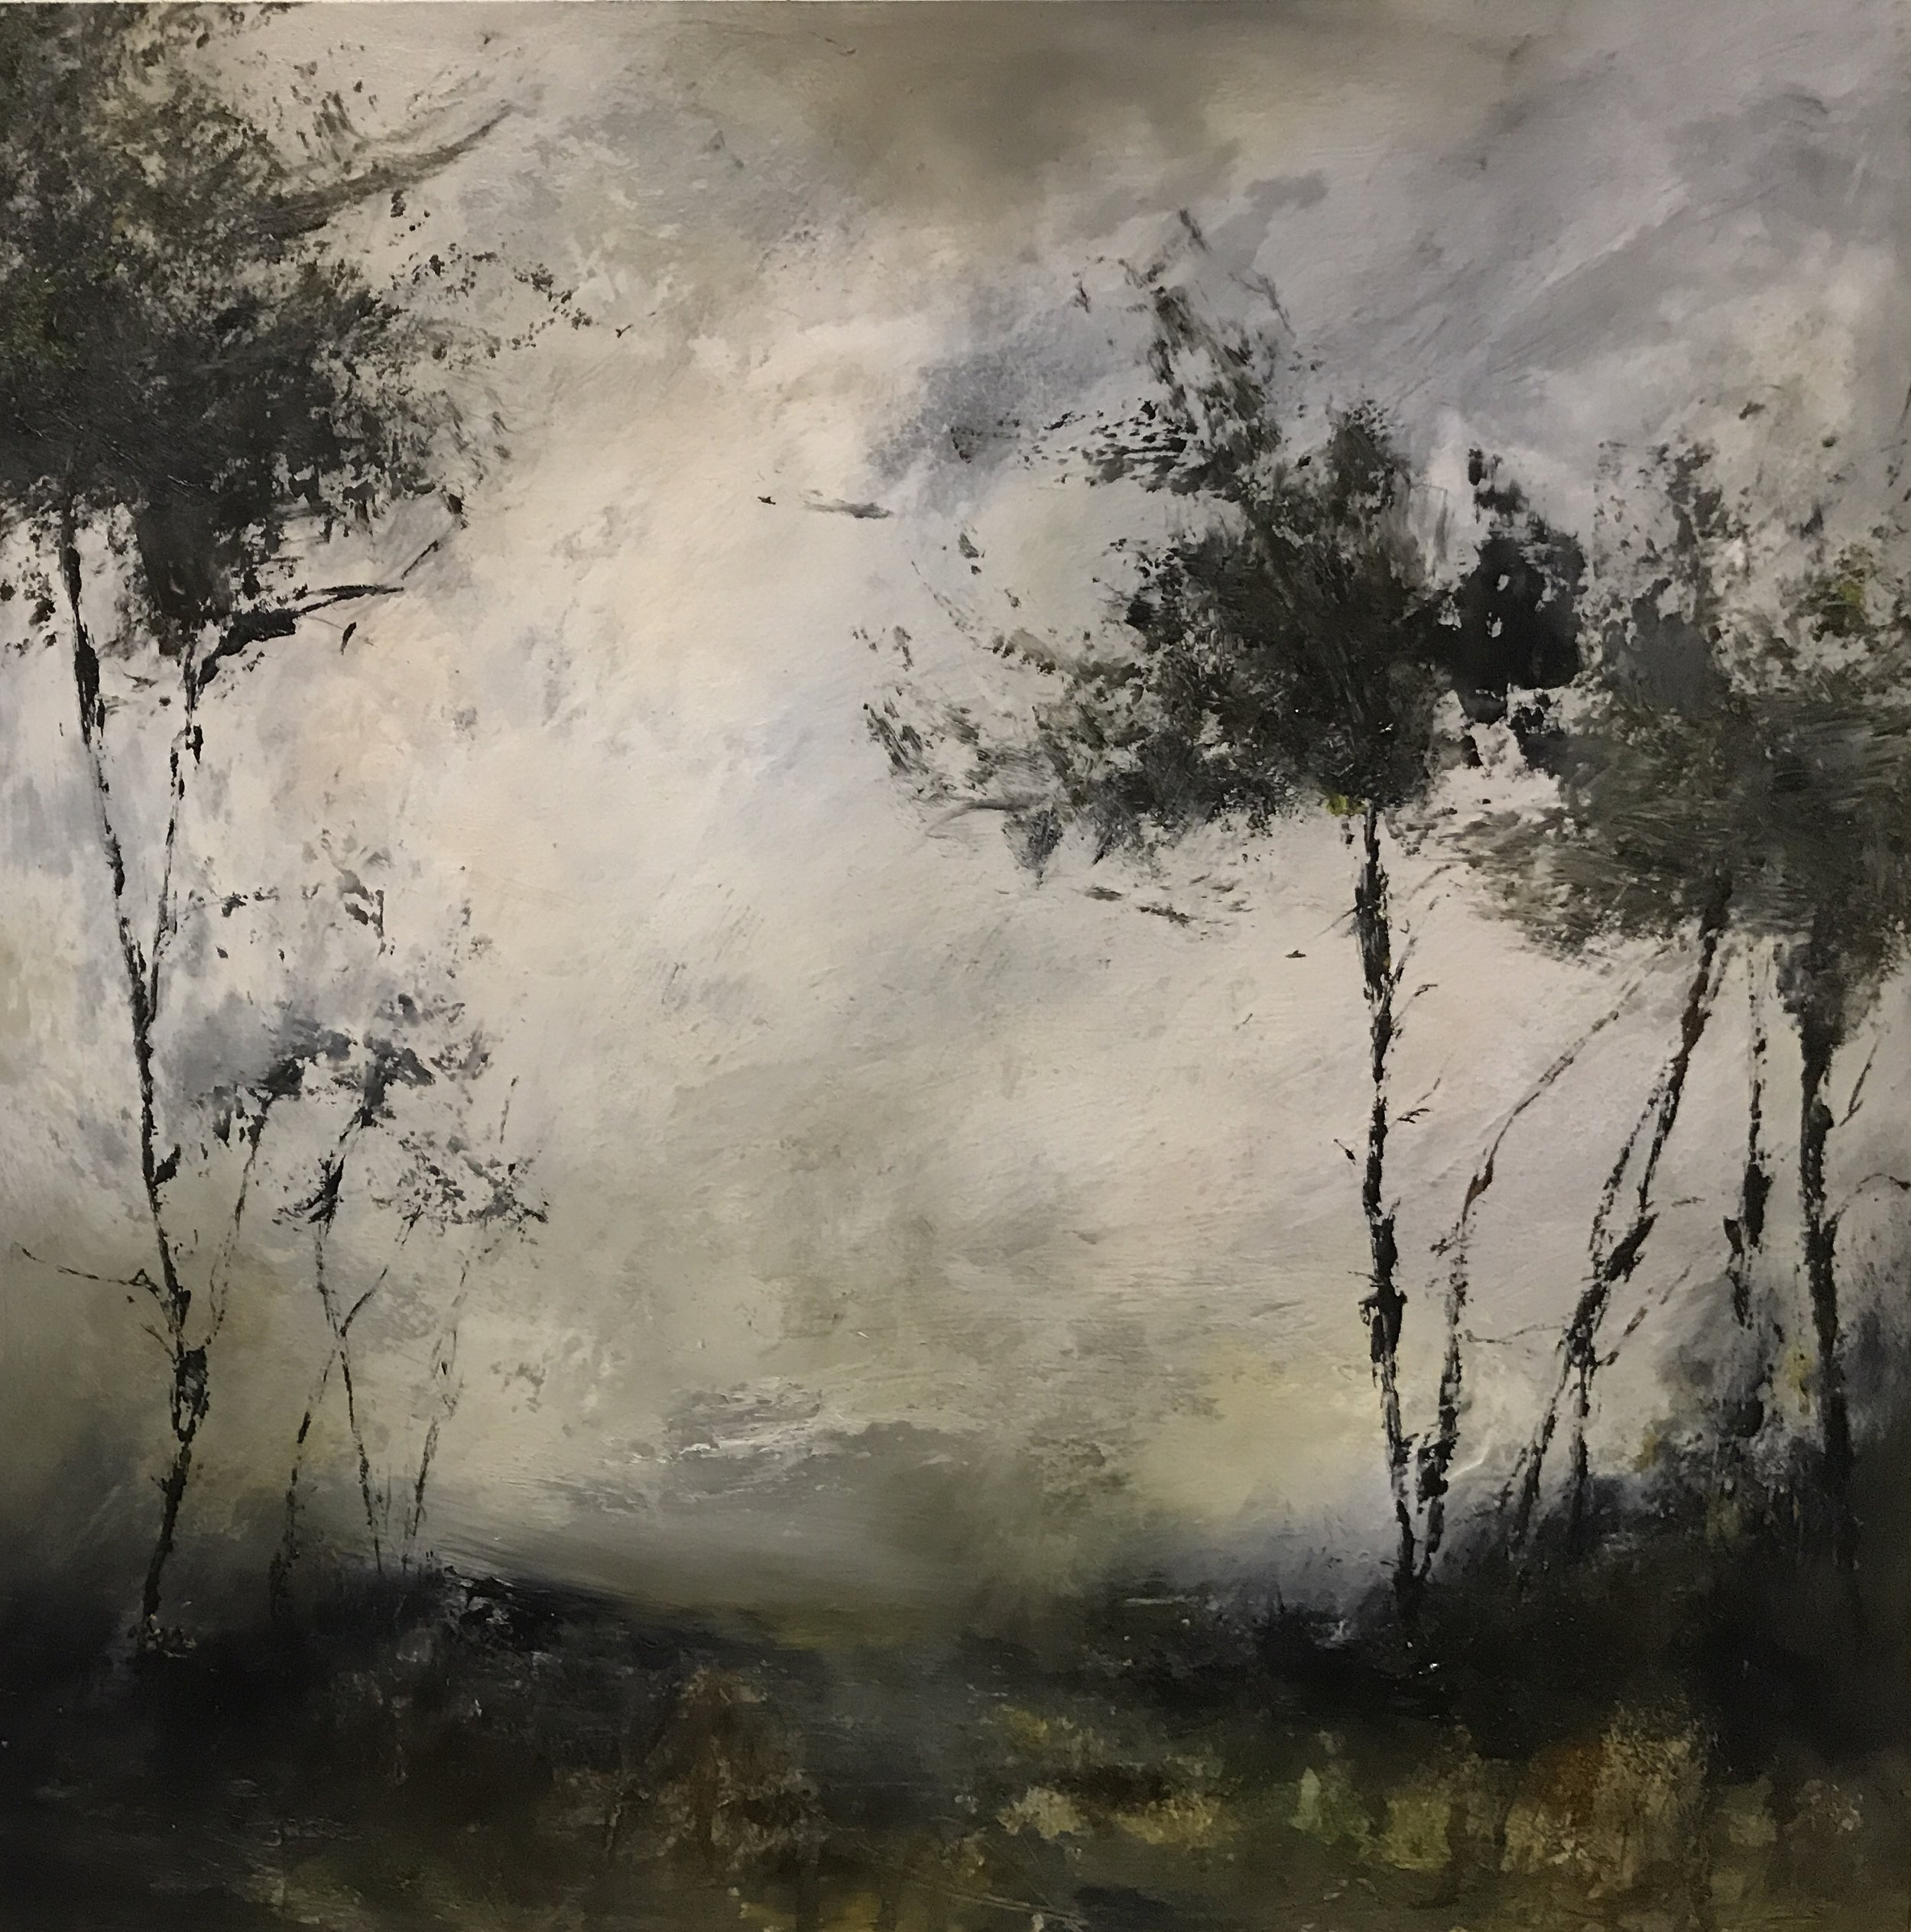 Rachel arif, Woodwind, Oil on wood panel, 45cm x 45cm x 3.5cm,  http://www.rachelarifart.com